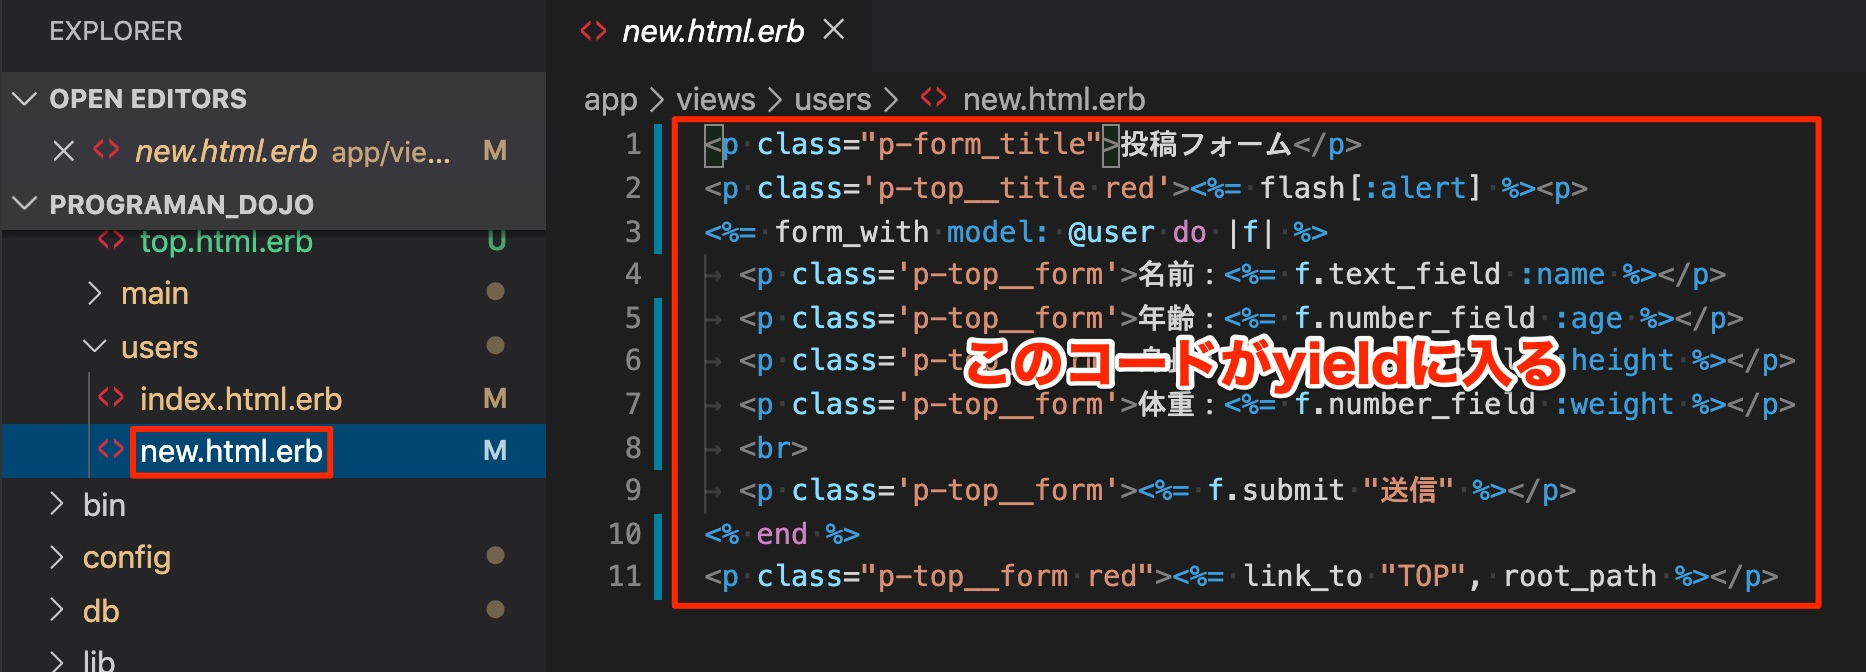 new.html.erb